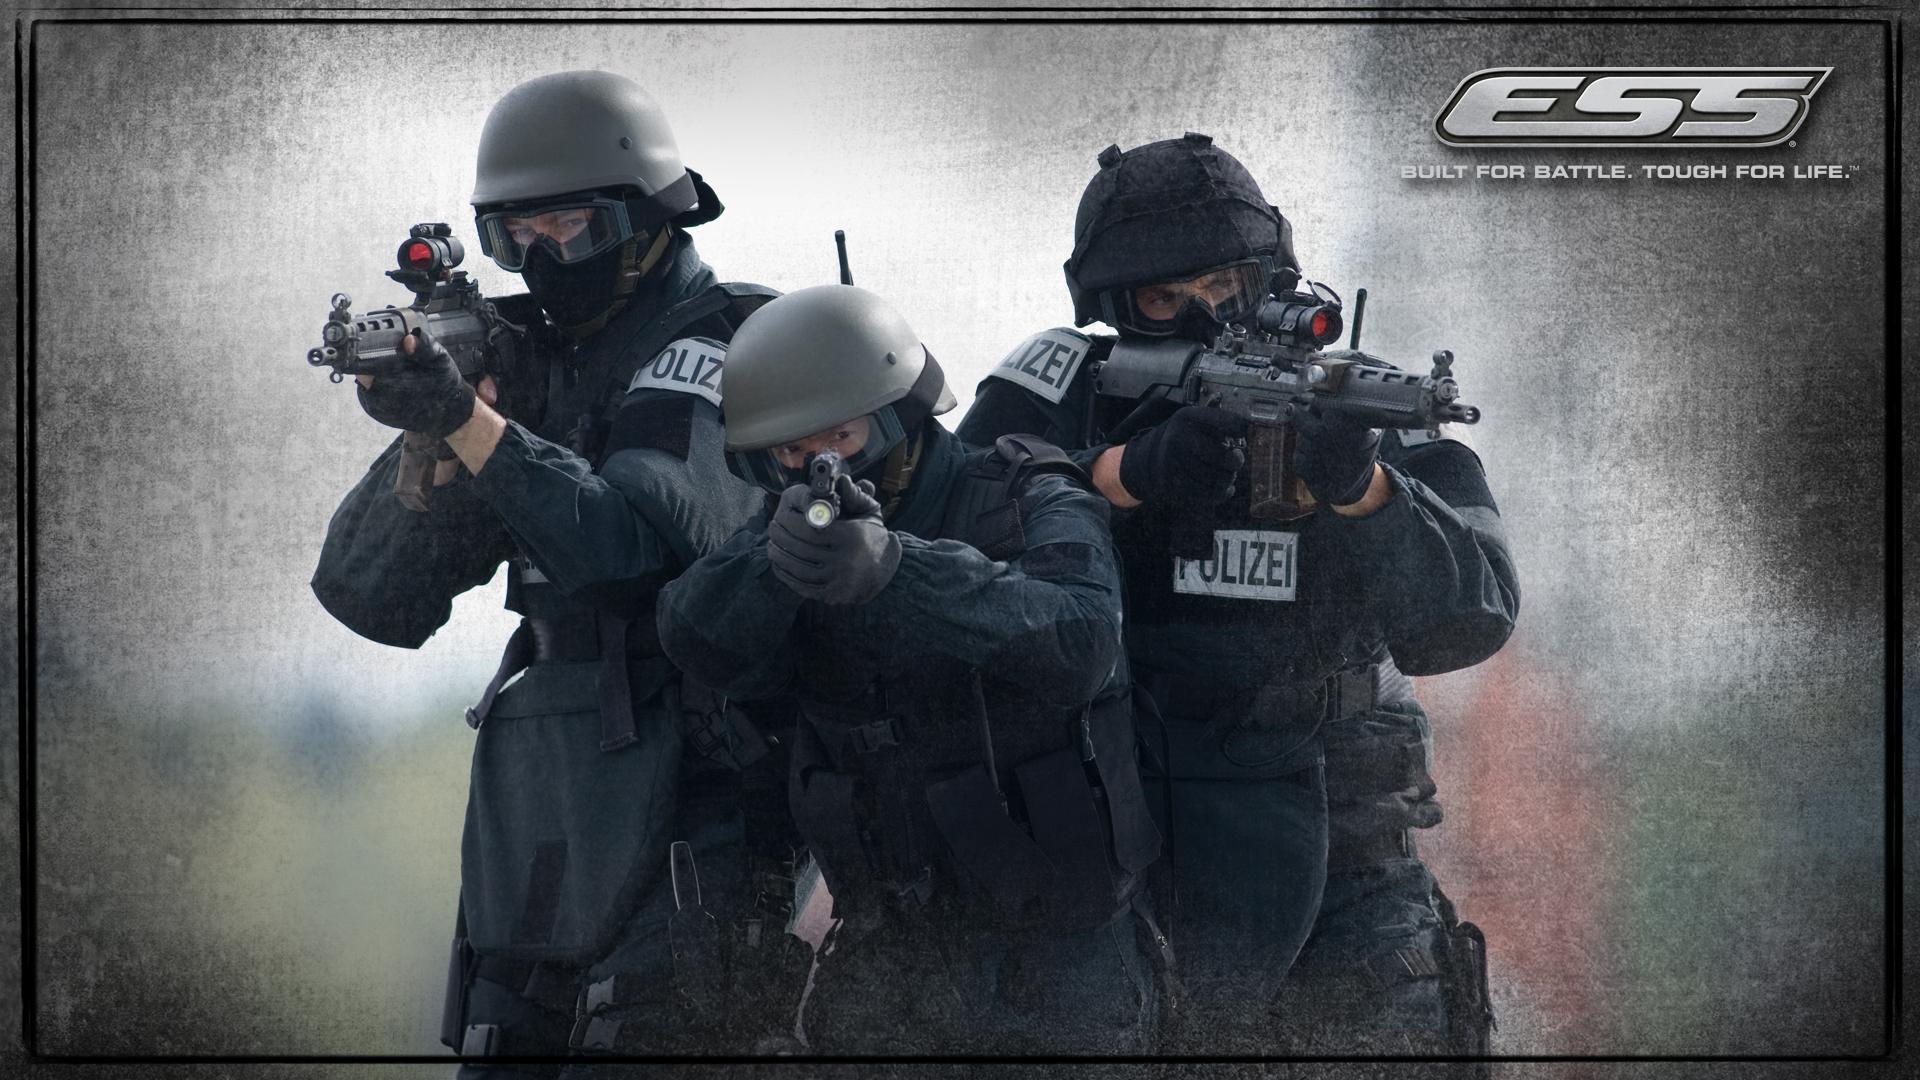 Wallpaper SWAT 1920x1080 1920x1080